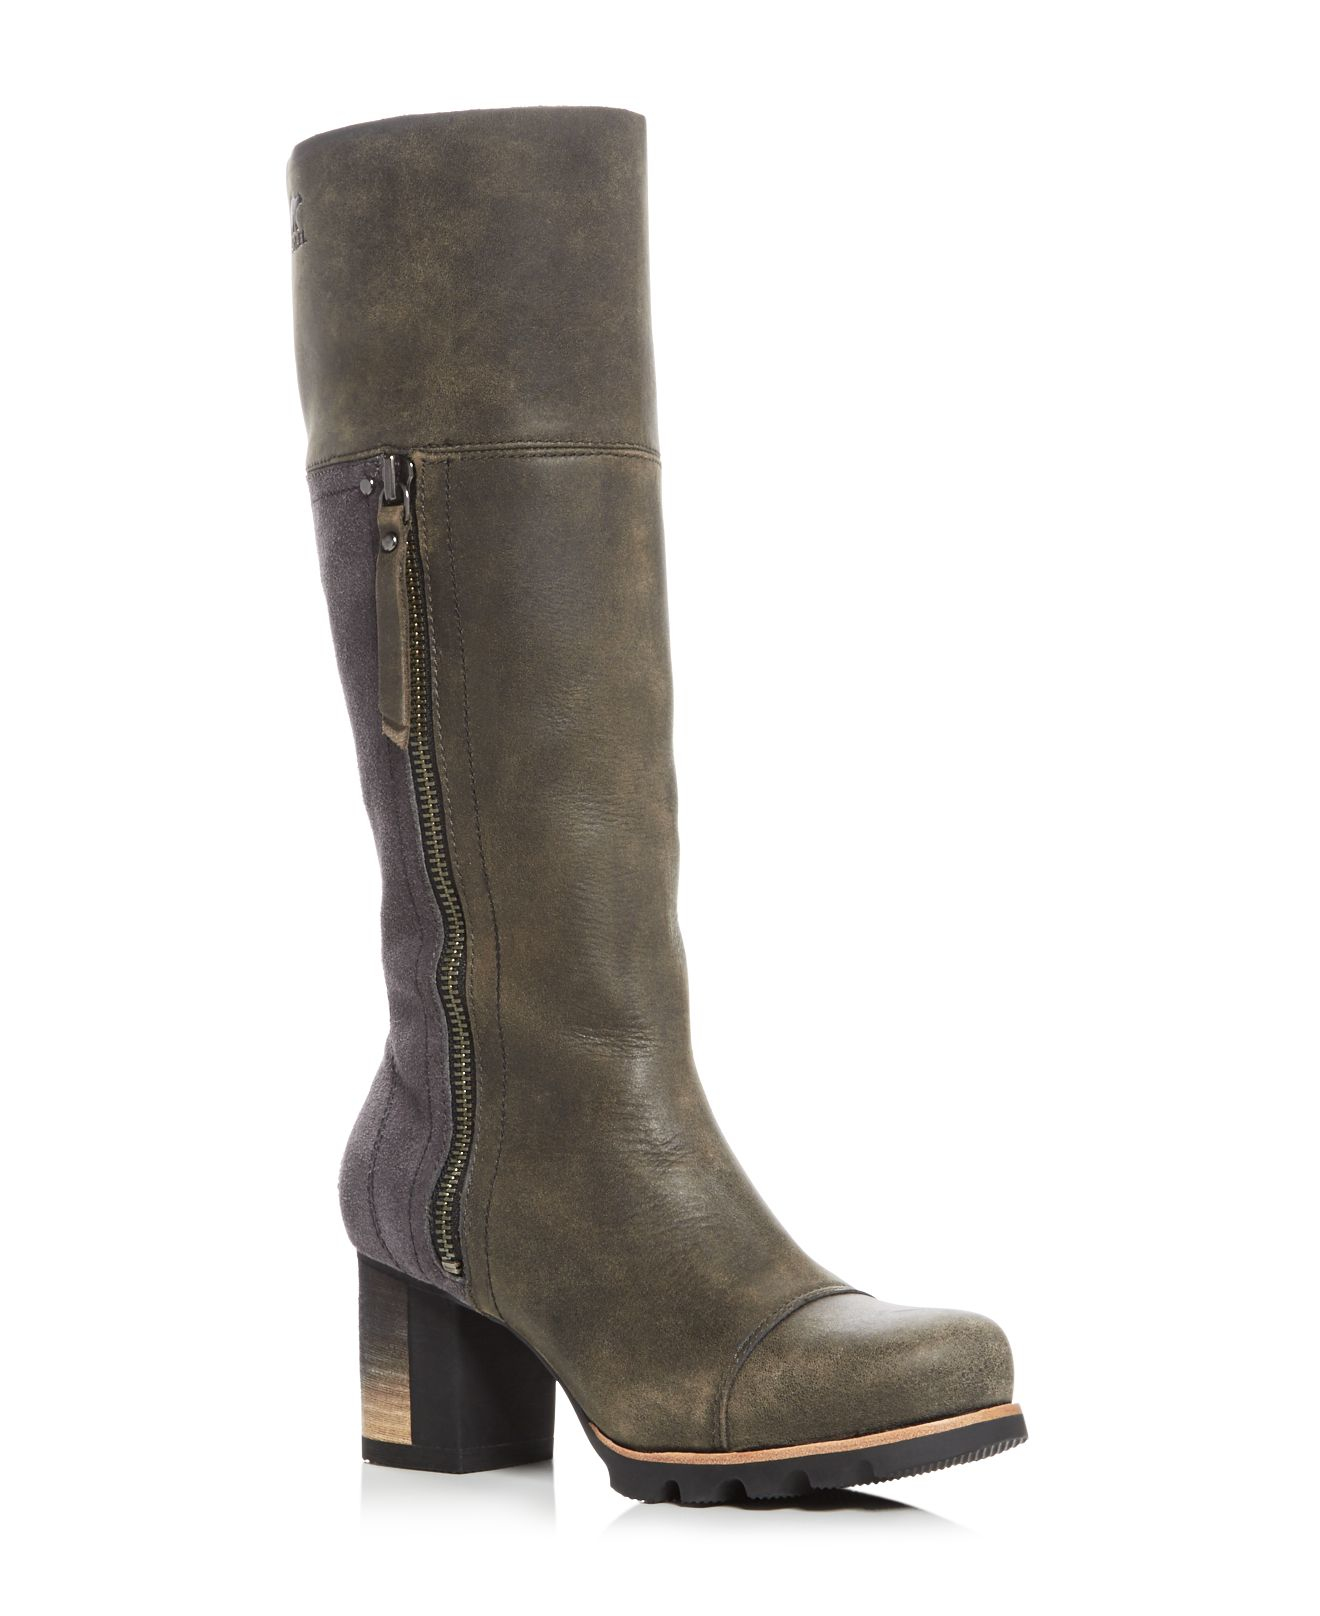 Lyst Sorel Addington Waterproof High Heel Tall Boots In Gray